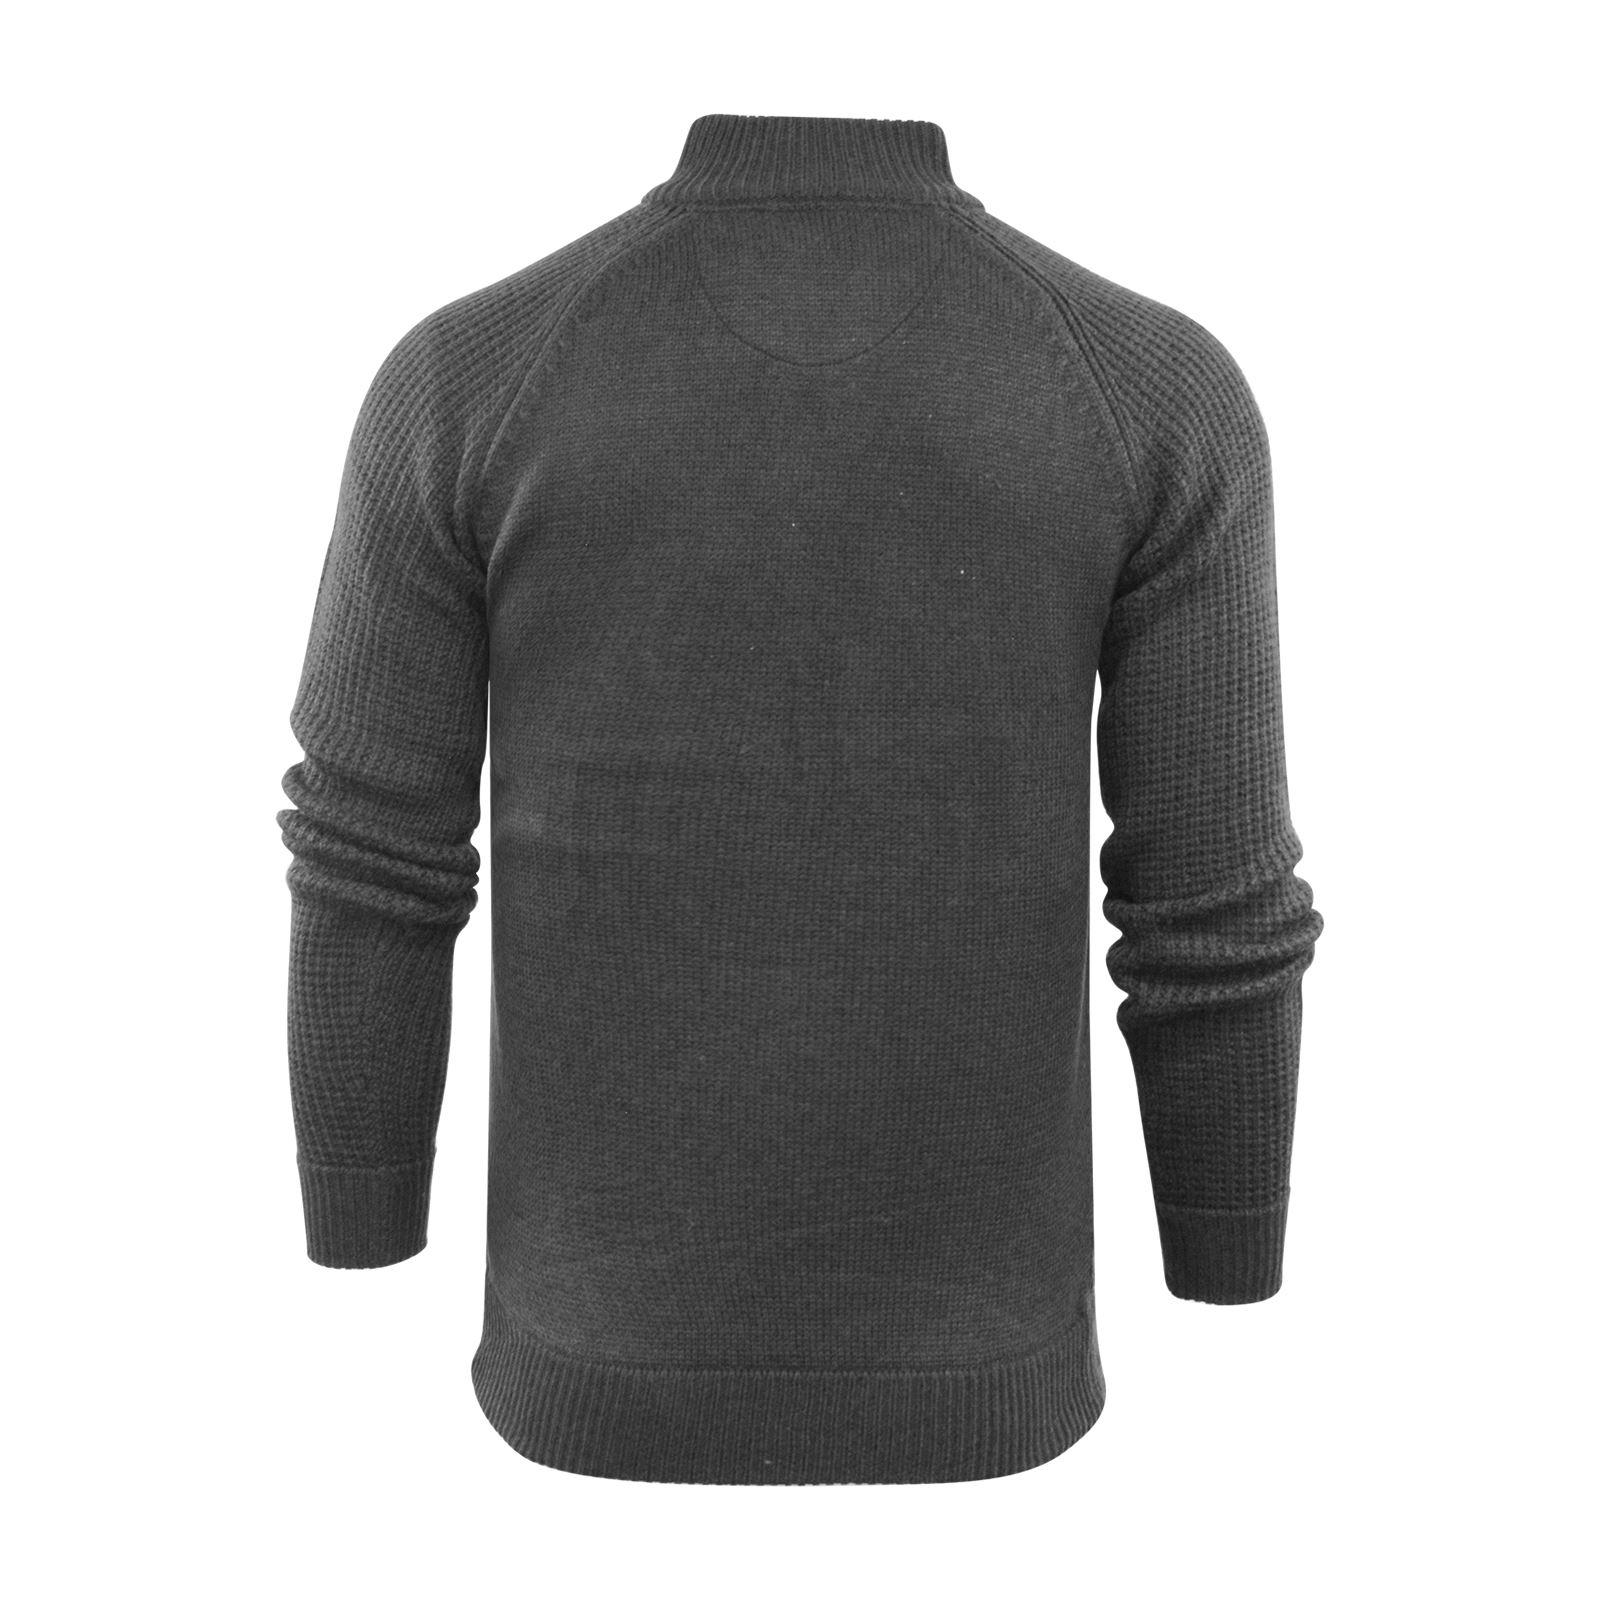 Brave-Soul-Mizrahi-Mens-Jumper-2-Button-Funnel-Neck-Sweater thumbnail 5